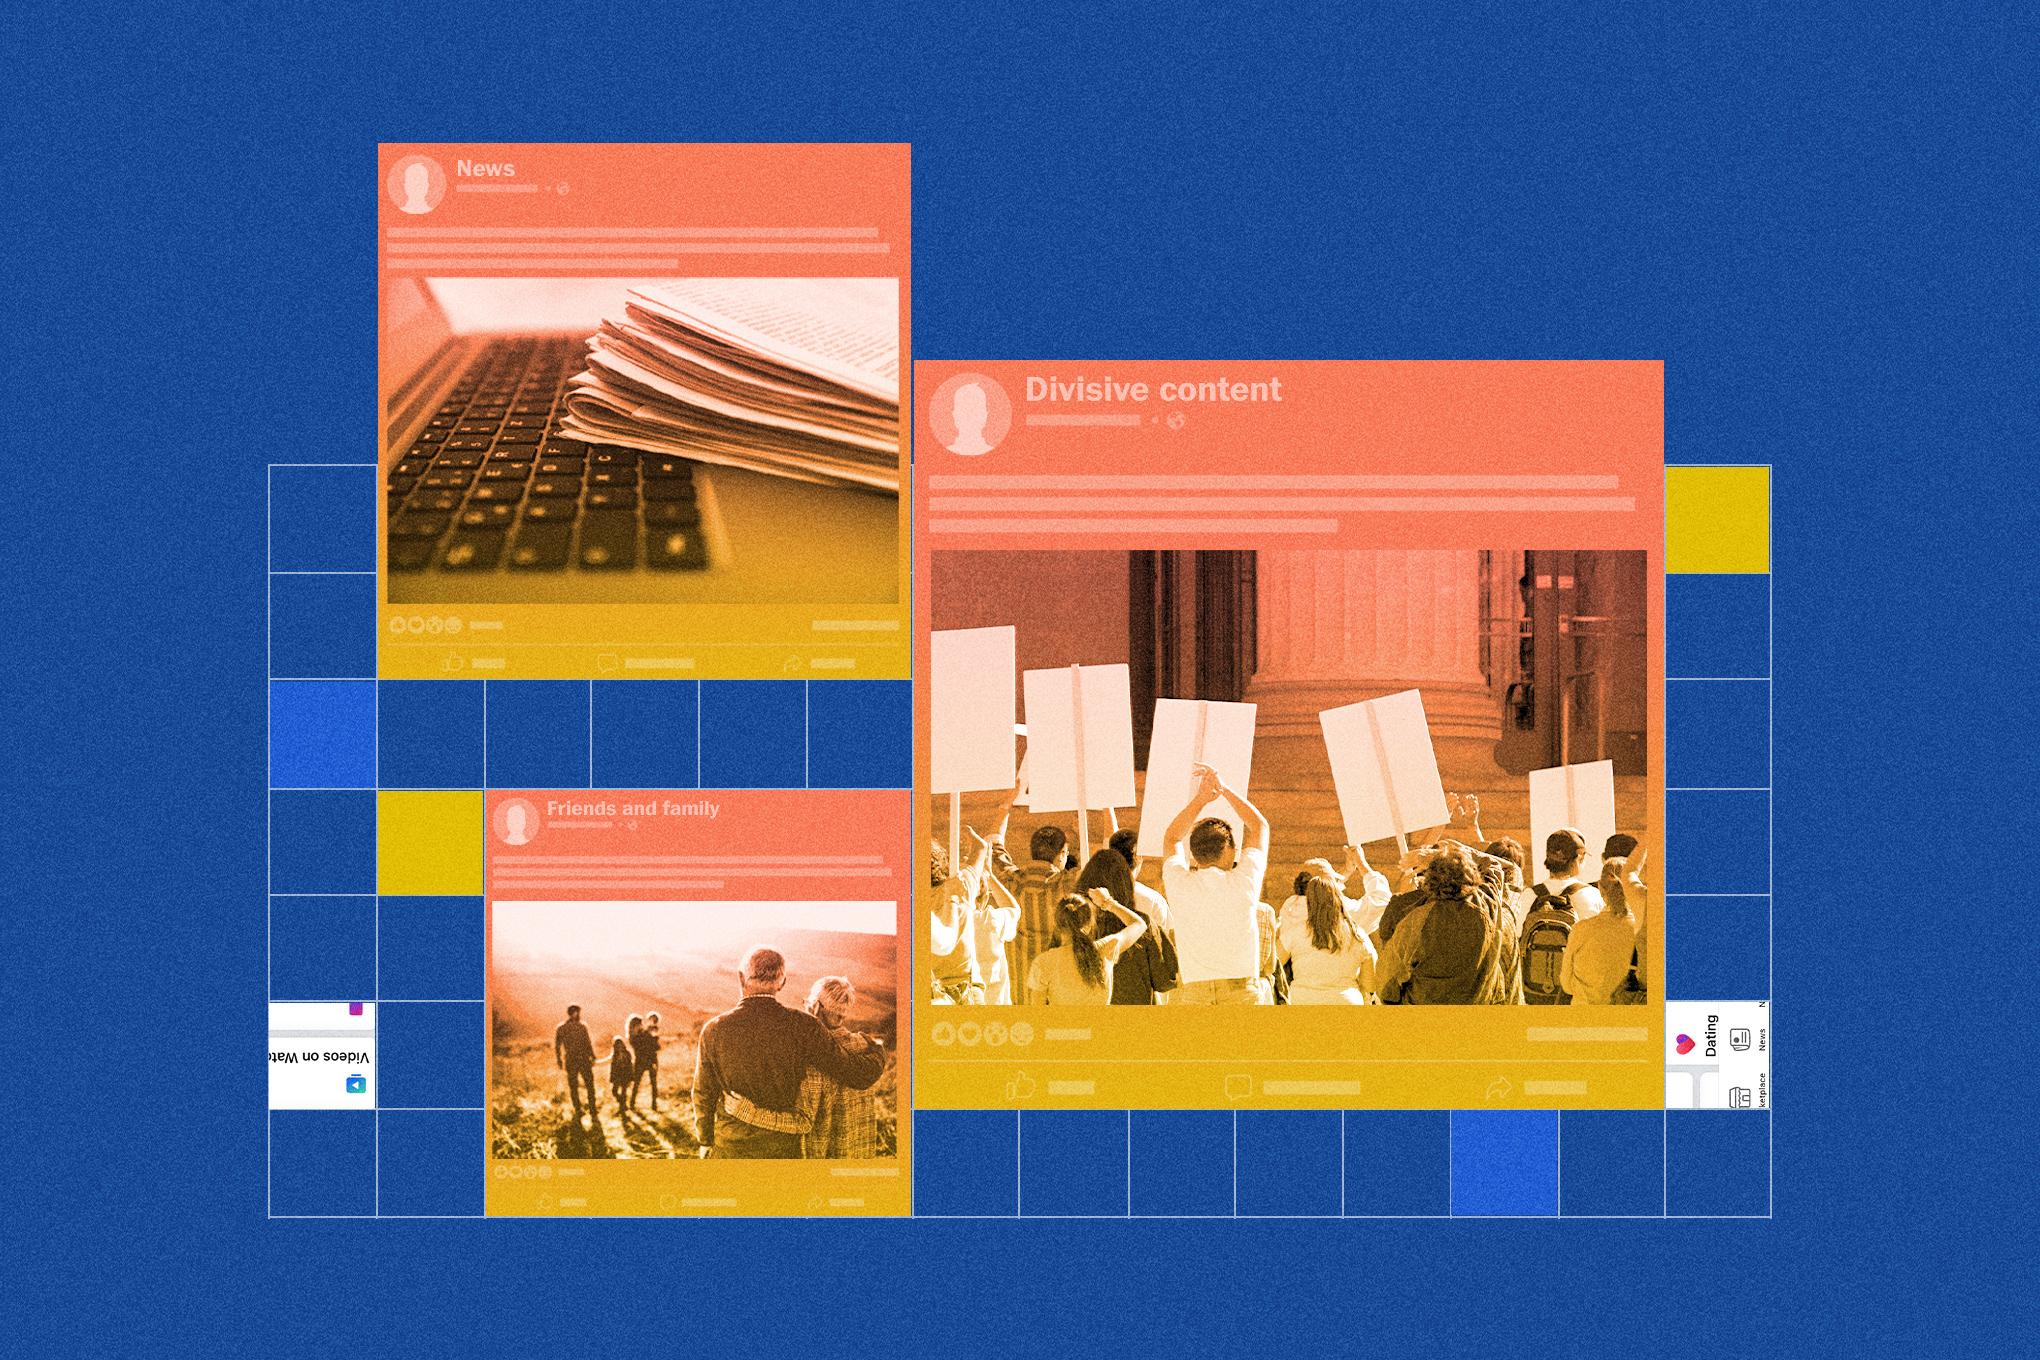 washingtonpost.com - Will Oremus, Chris Alcantara, Jeremy B. Merrill, Artur Galocha - How Facebook shapes your feed